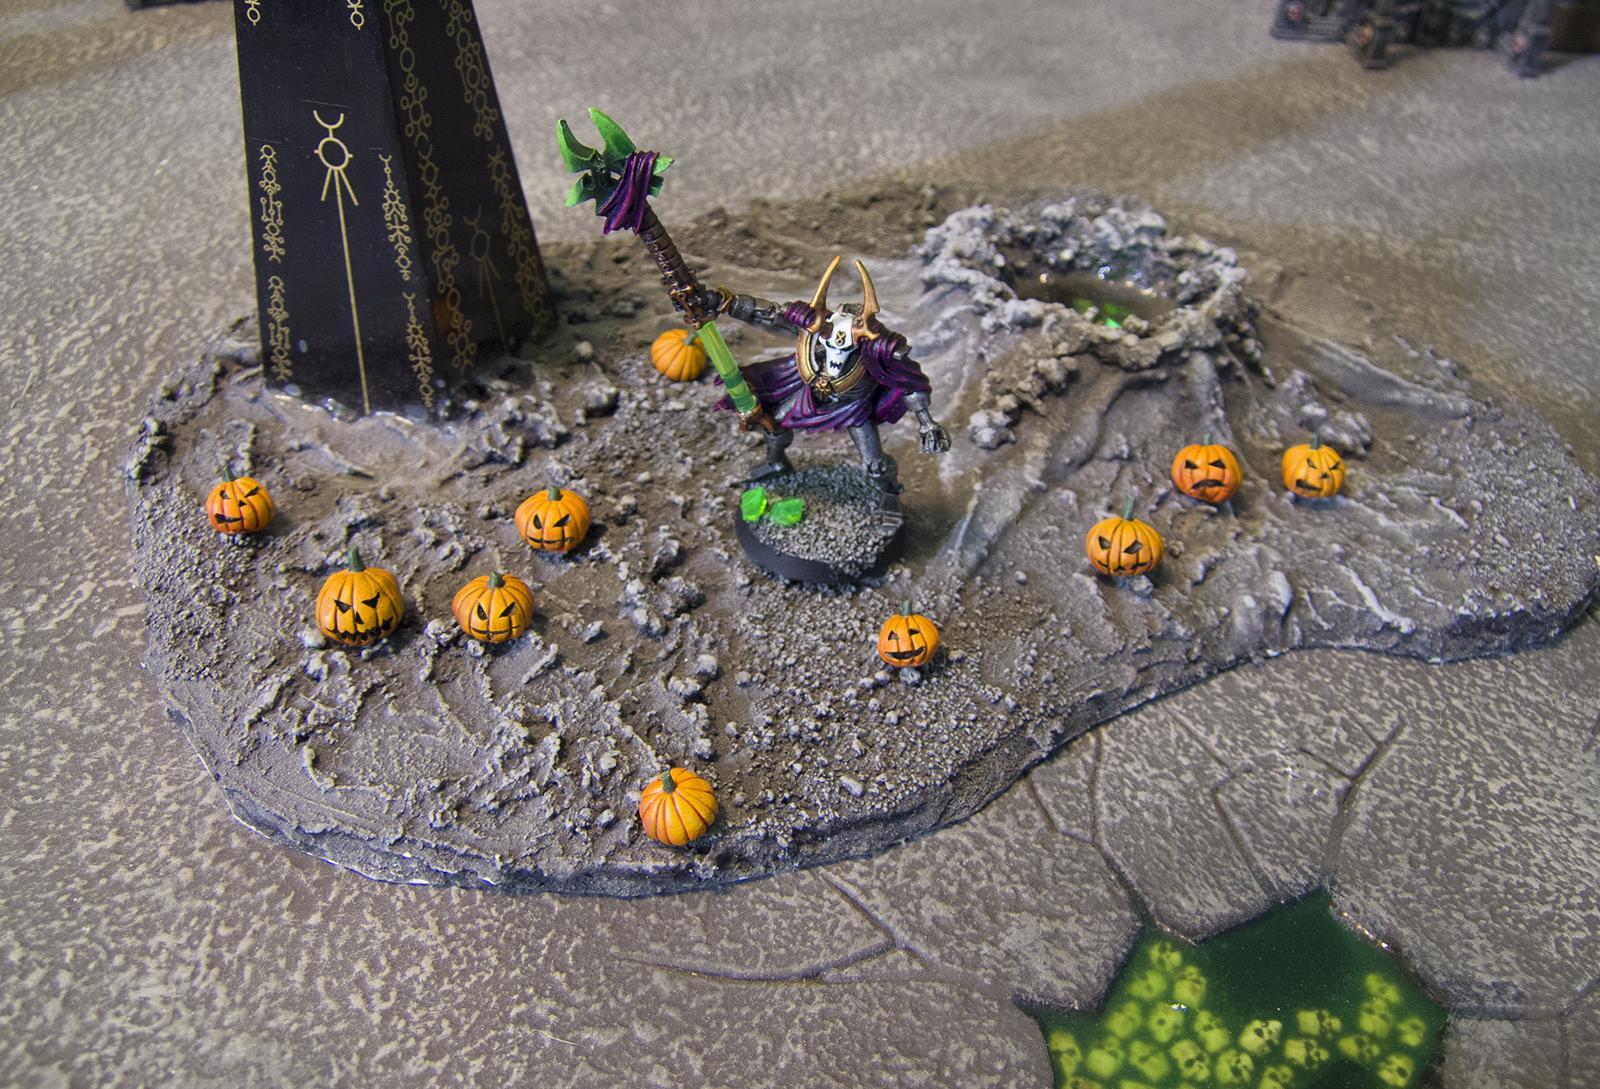 Army Box, Necron Army Box, Necron Lord, Necrons, Ouze, Pumpkin, Pumpkins